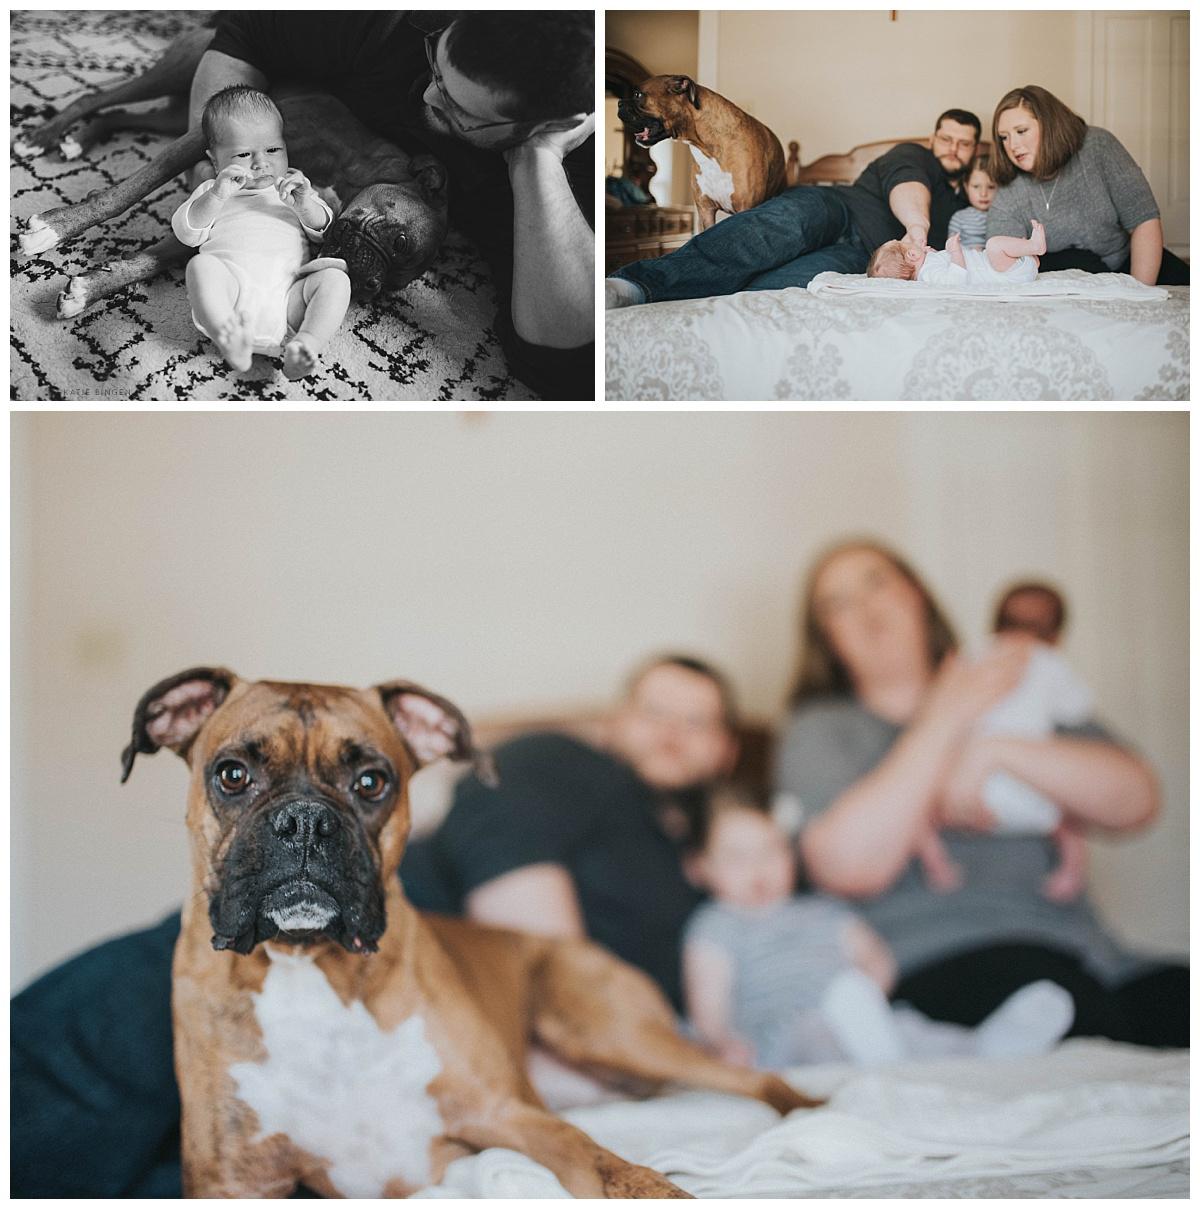 oconomoc-newborn-lifestyle-photographer (9).jpg